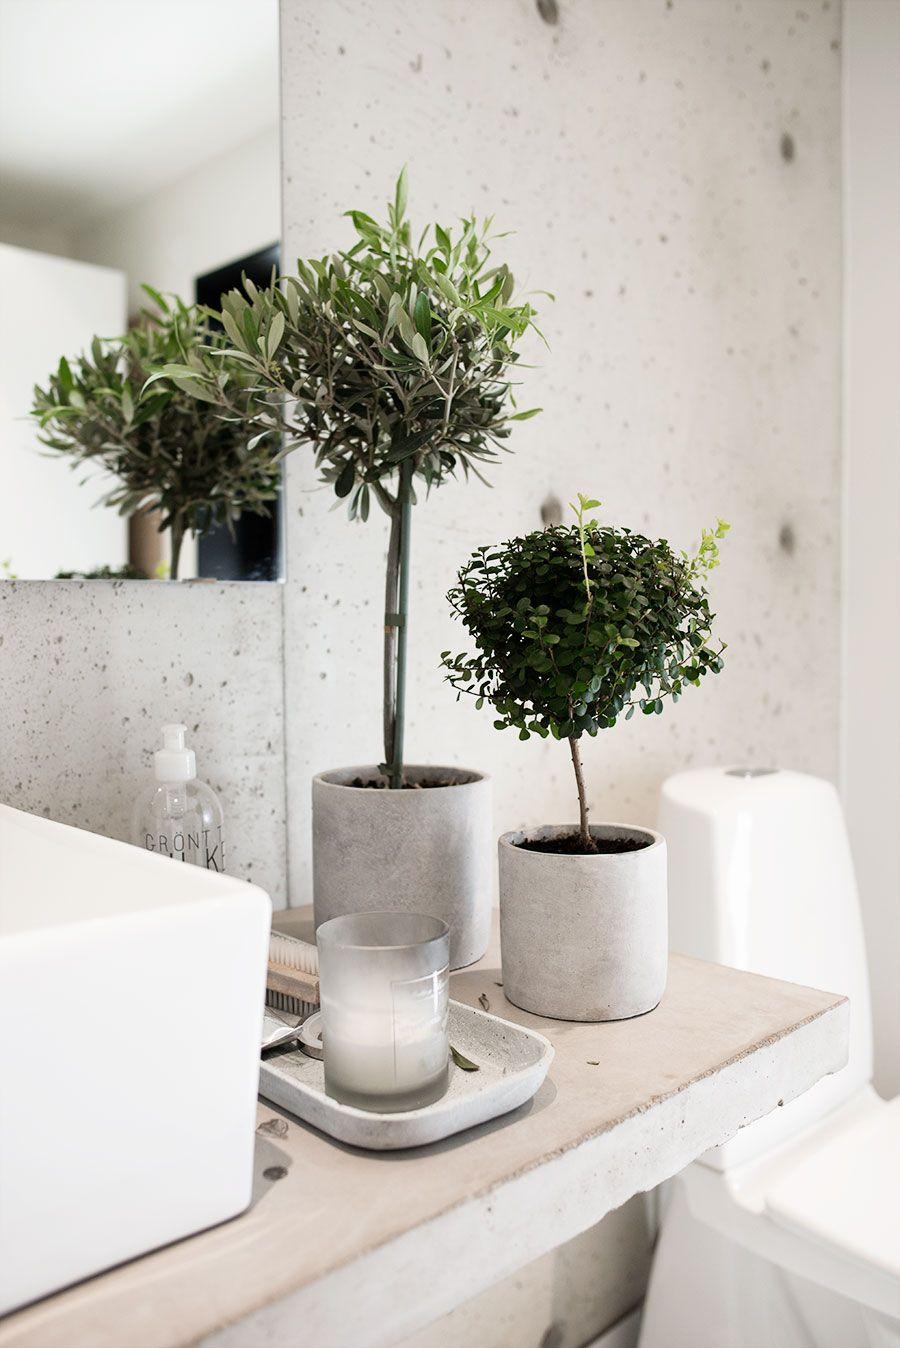 10x de mooiste badkamers met beton | planters, (2017) and a house